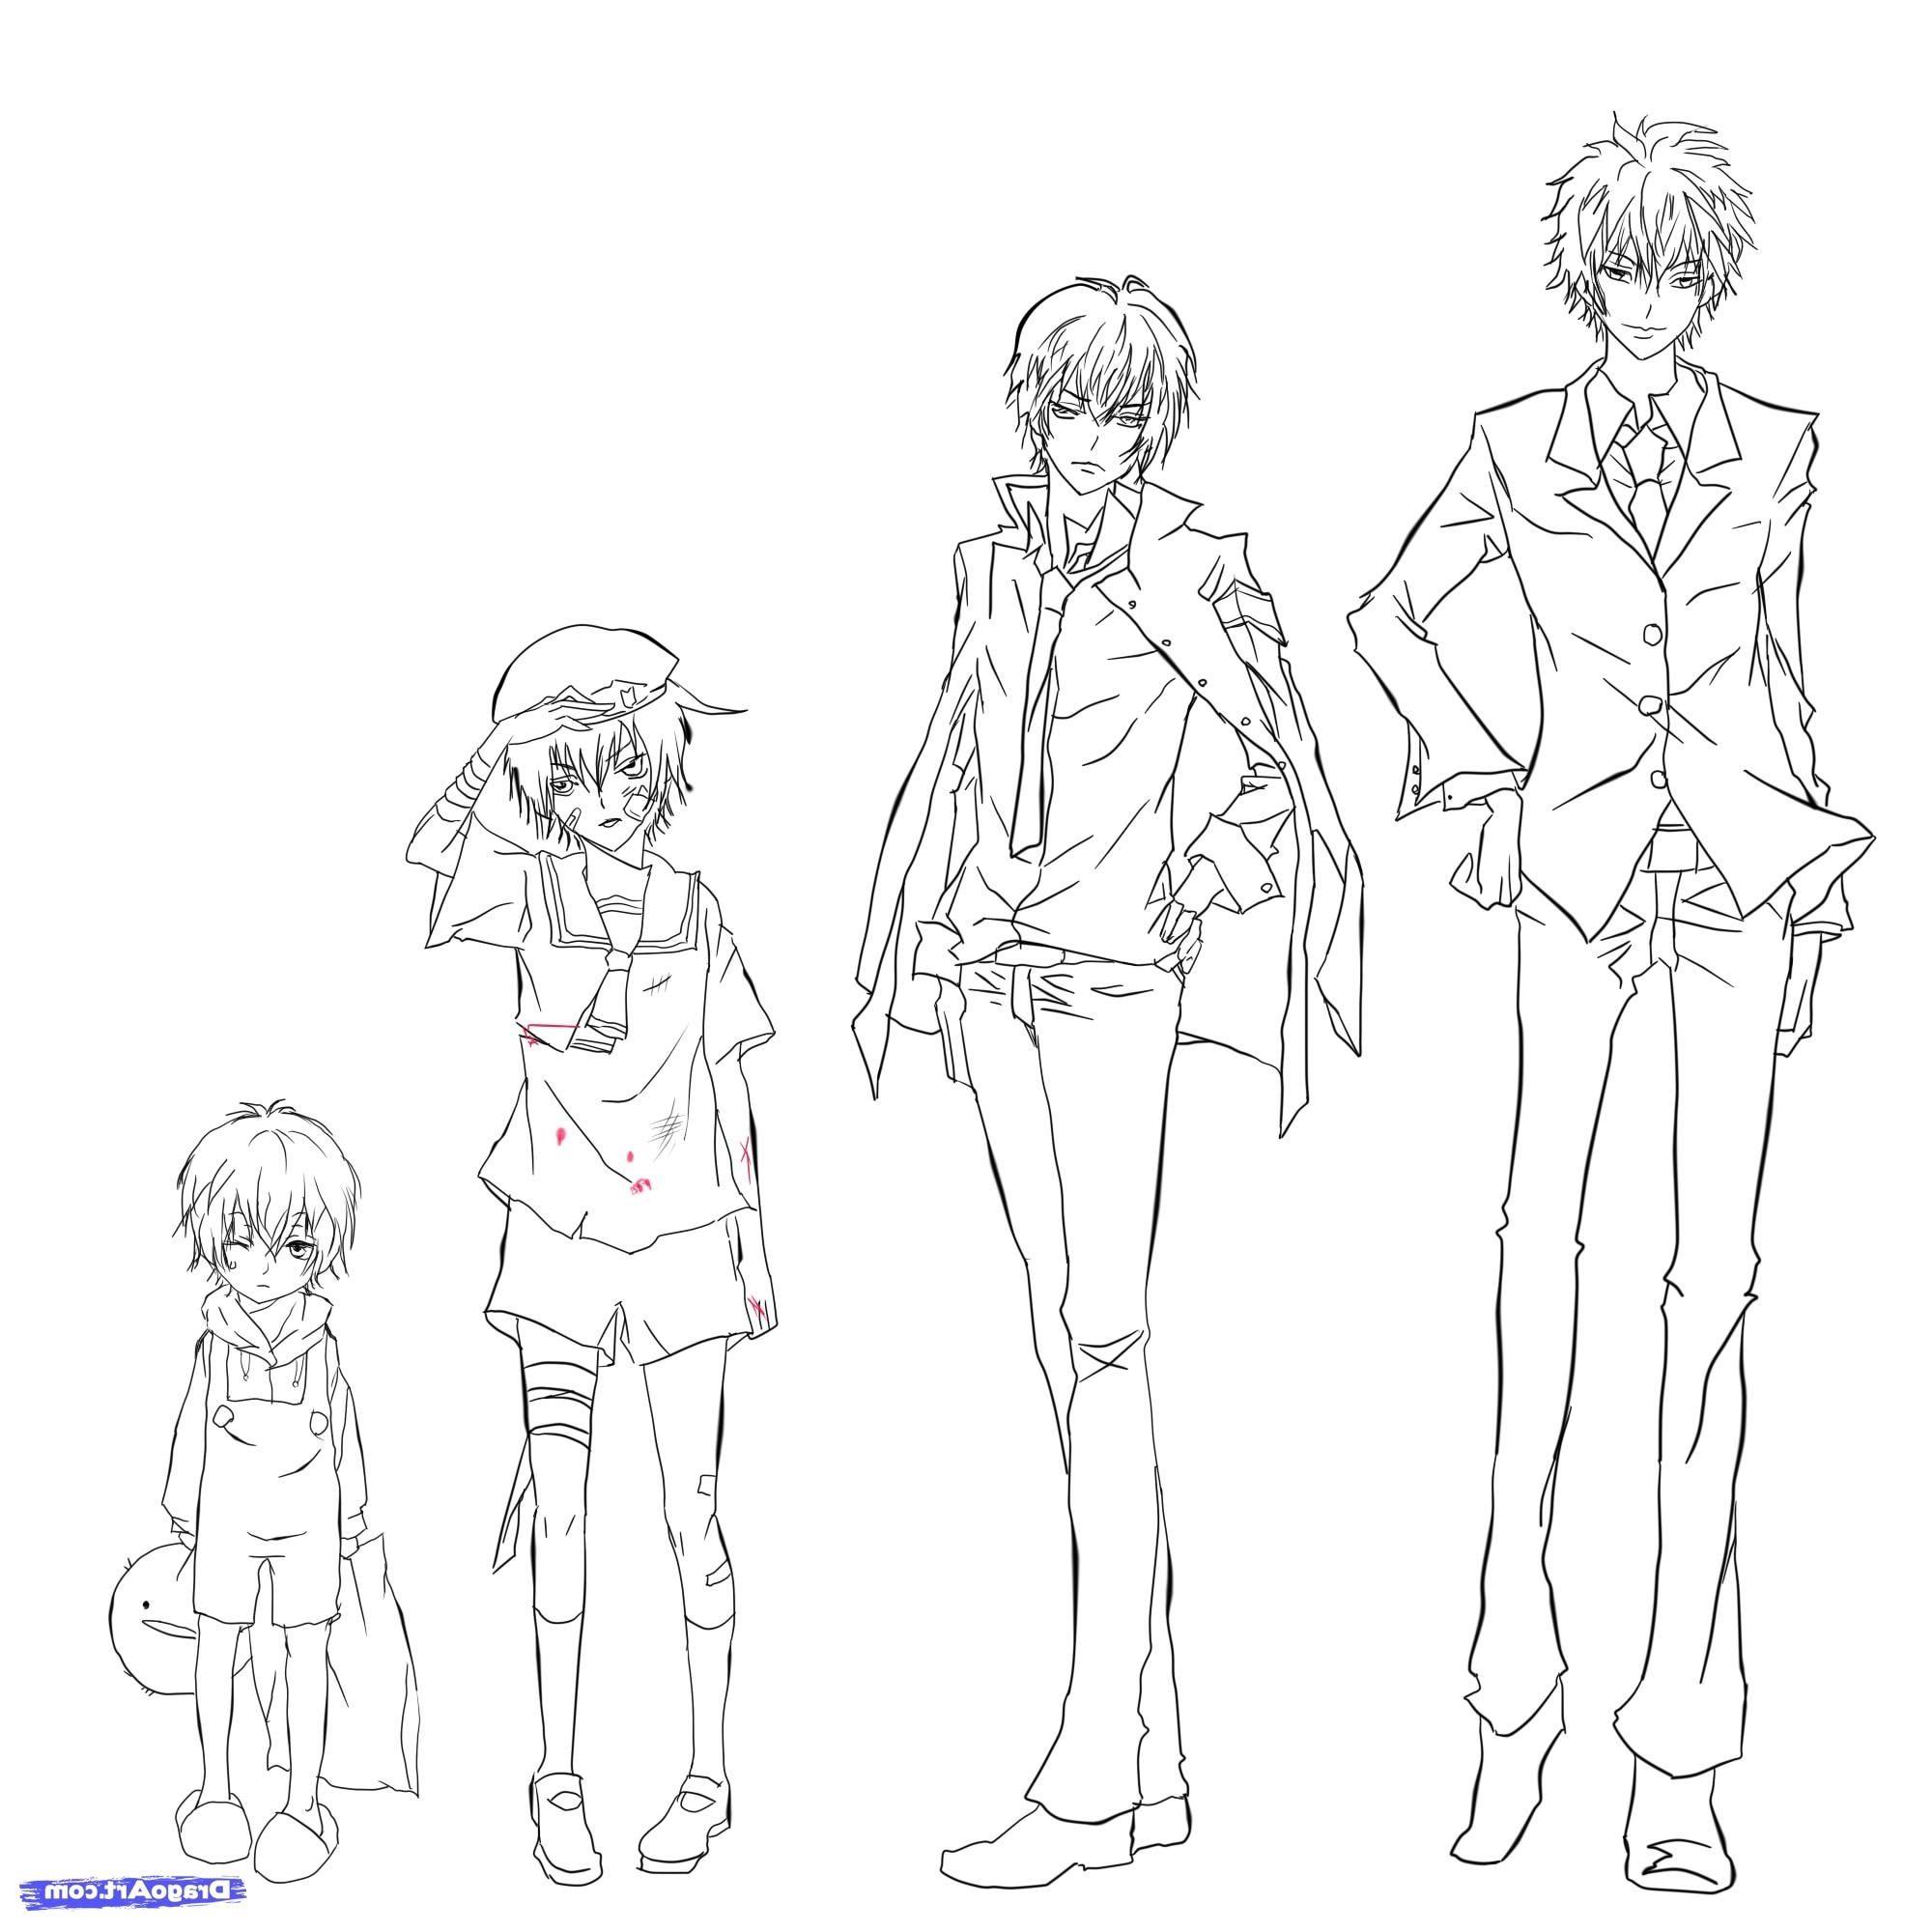 Image Result For Full Body Reference Anime Drawing Tecnicas De Desenho Desenho